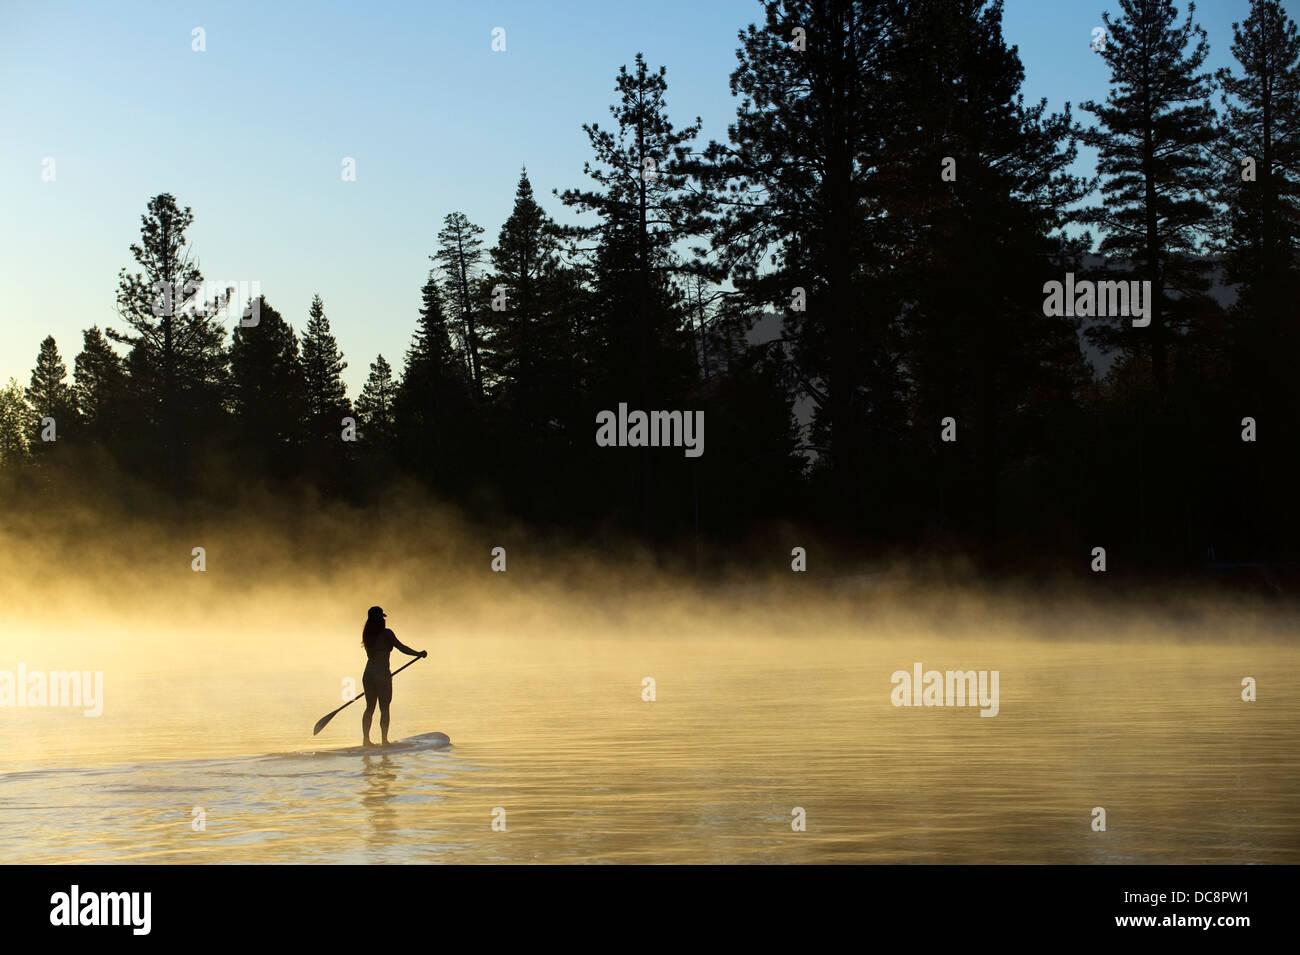 Eine Frau, ist Stand Up Paddling (SUP) bei Sonnenaufgang im Nebel in Lake Tahoe, CA Silhouette. Stockbild